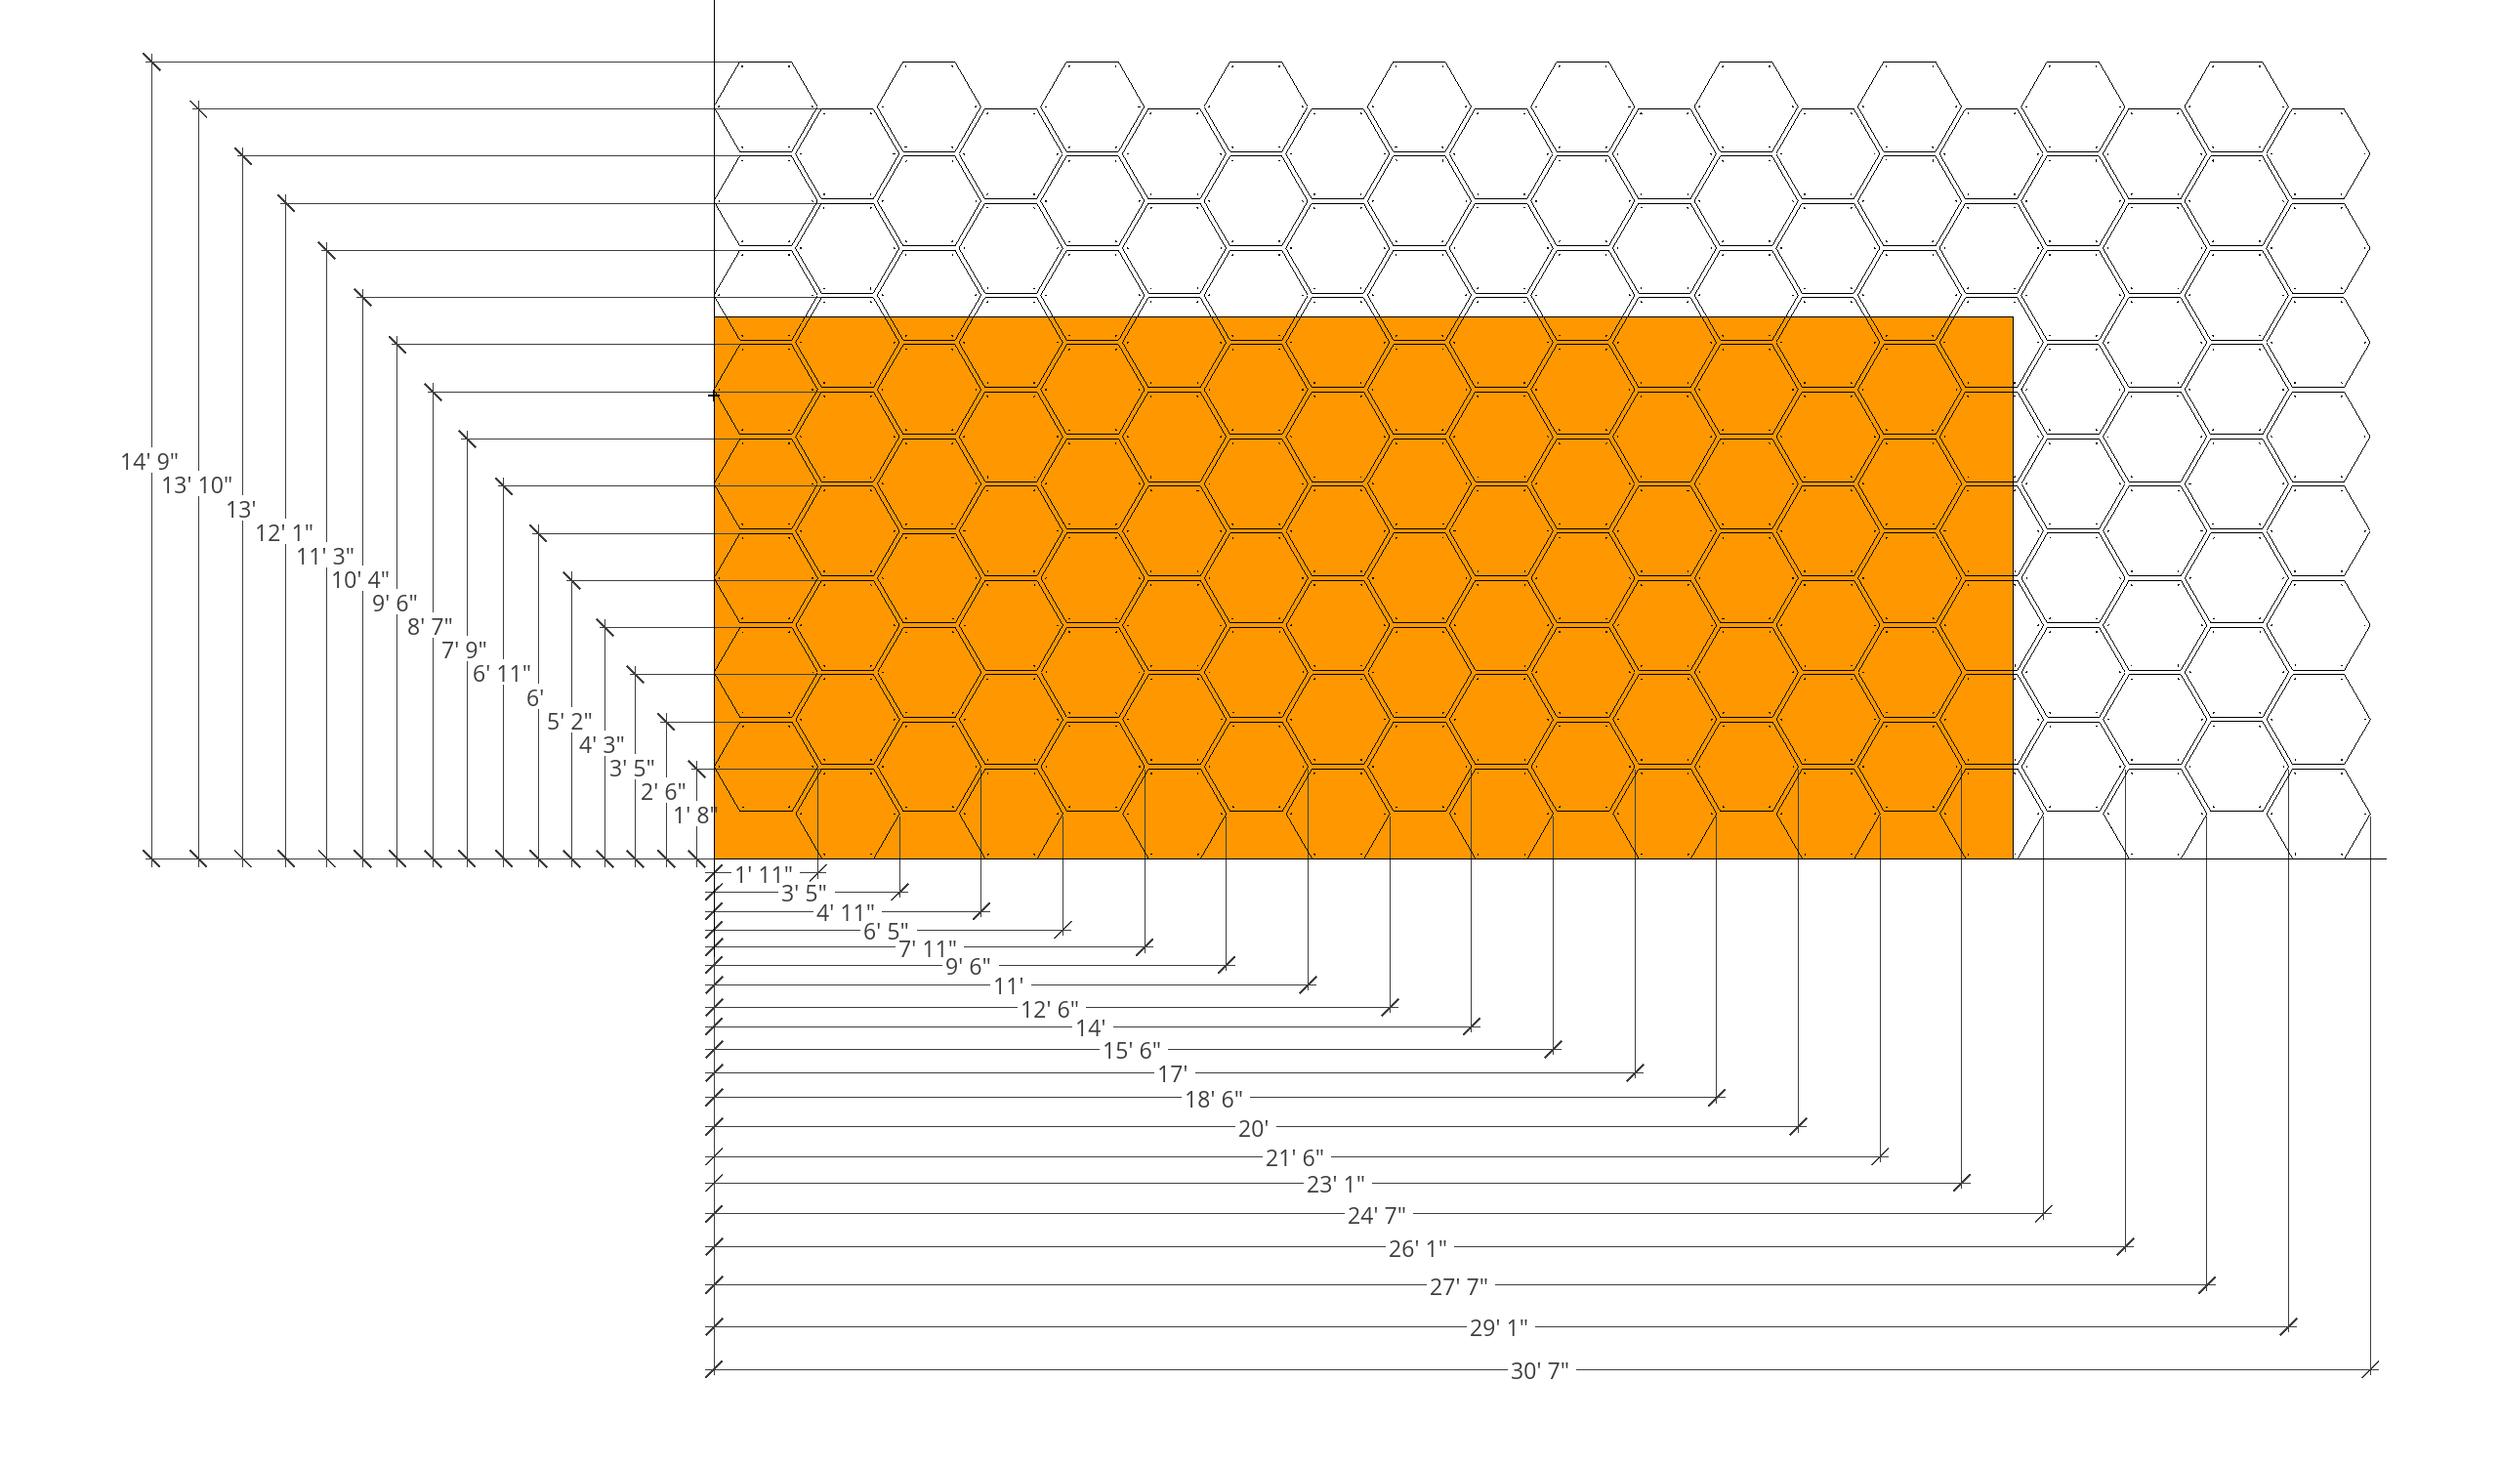 HoneycombGraphExample.png